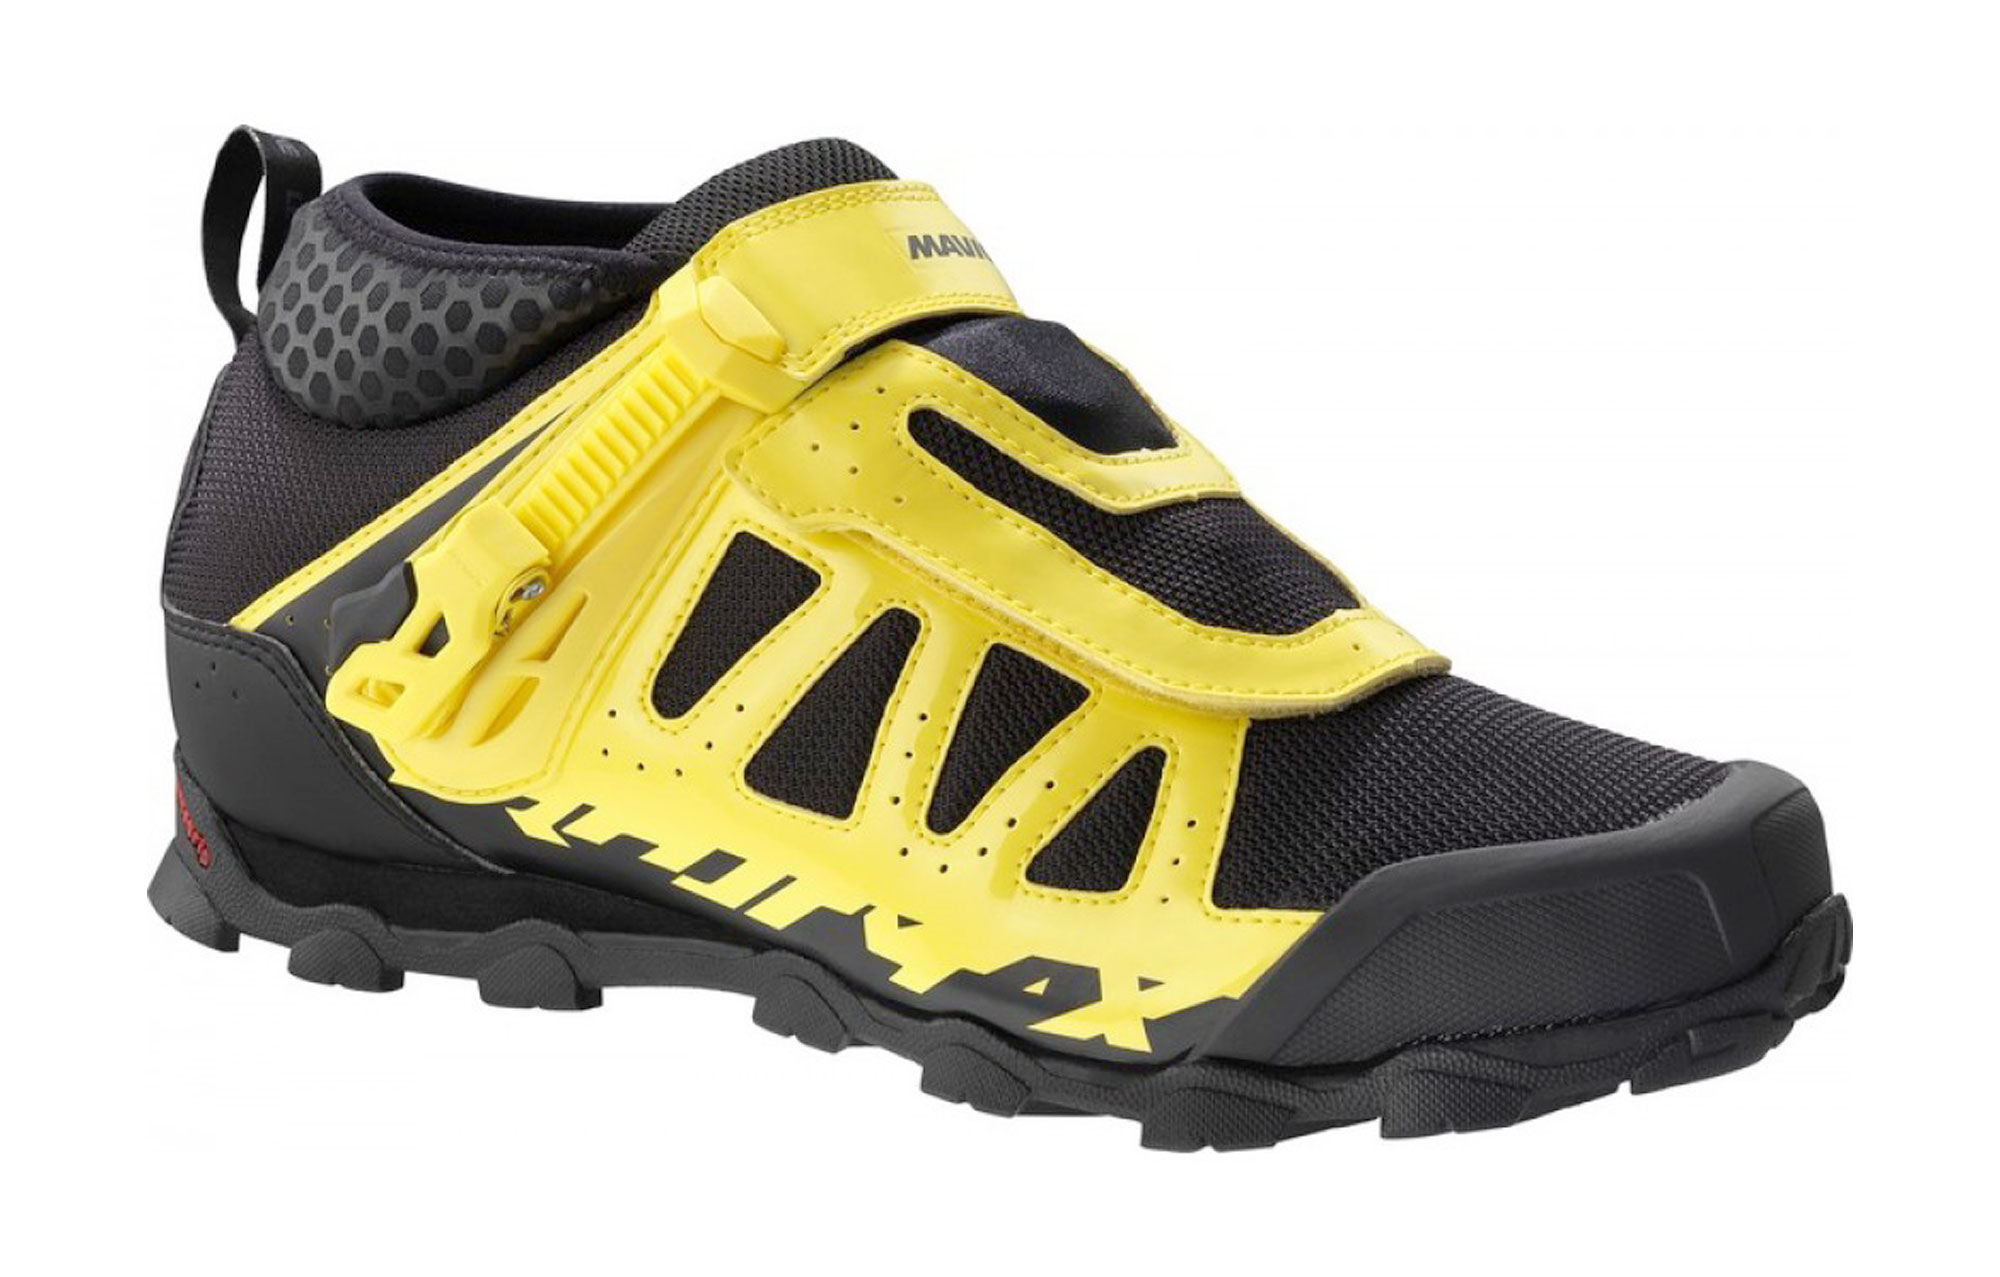 chaussures vtt mavic crossmax xl pro jaune noir. Black Bedroom Furniture Sets. Home Design Ideas